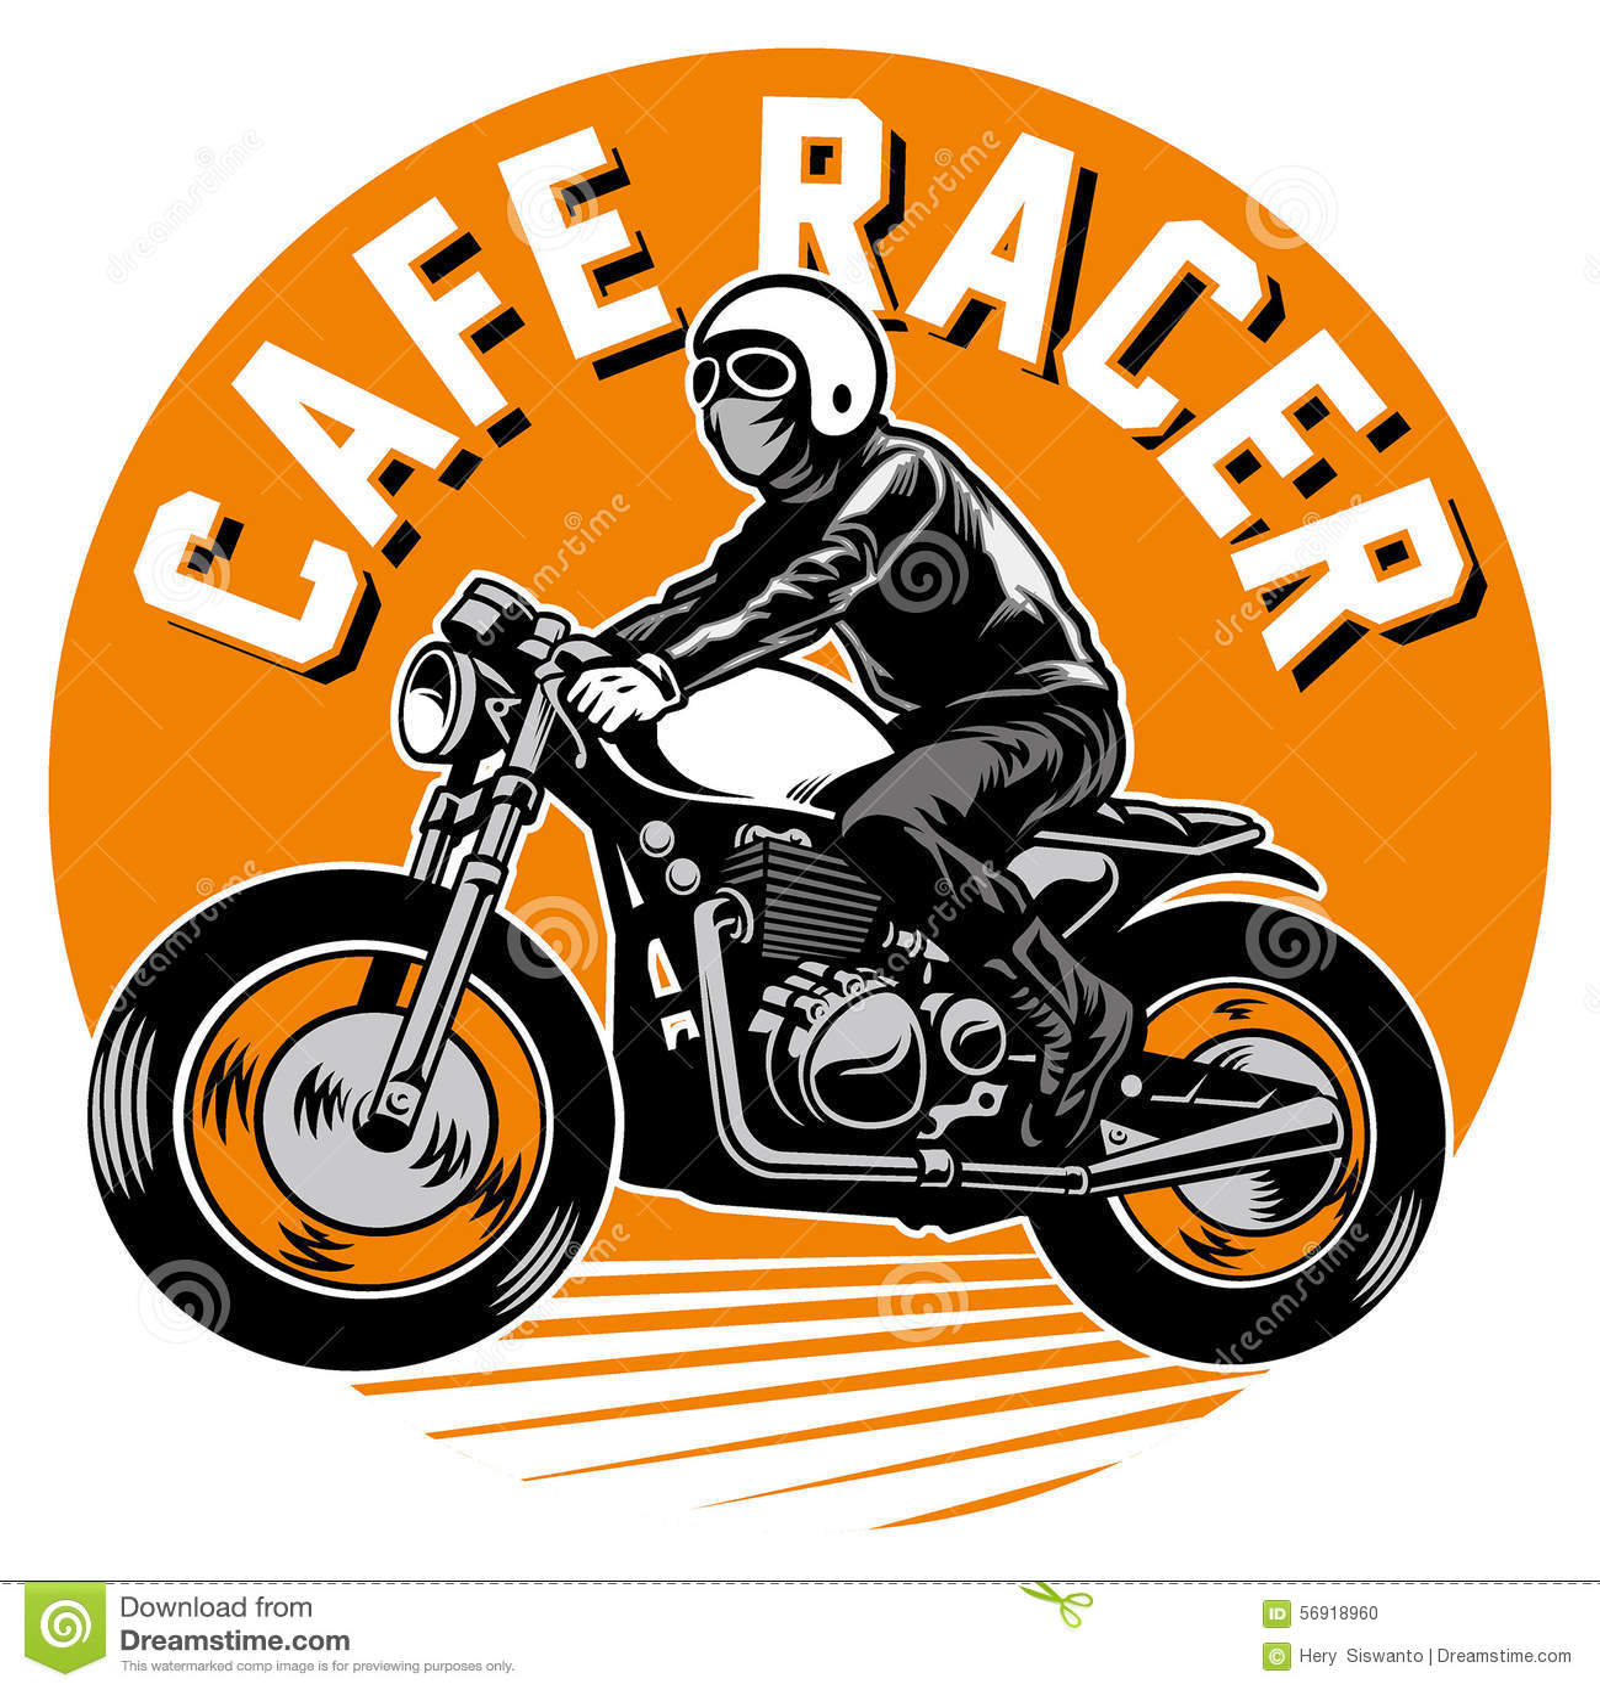 Cafe Racer Vector